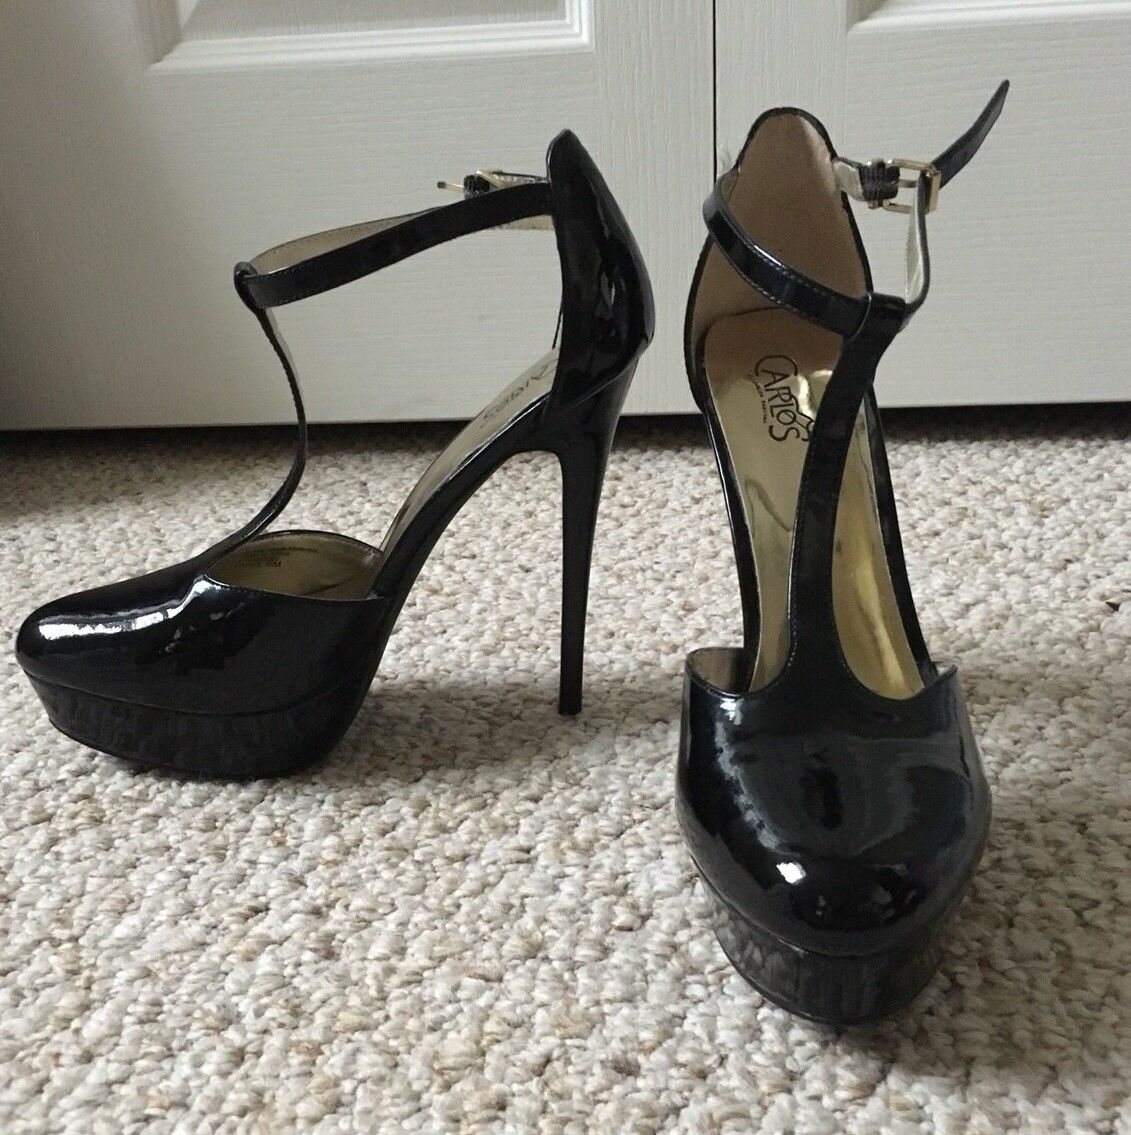 New w/o Box Carlos Santana Prince Black Patent Platform T-strap High Heels 8M